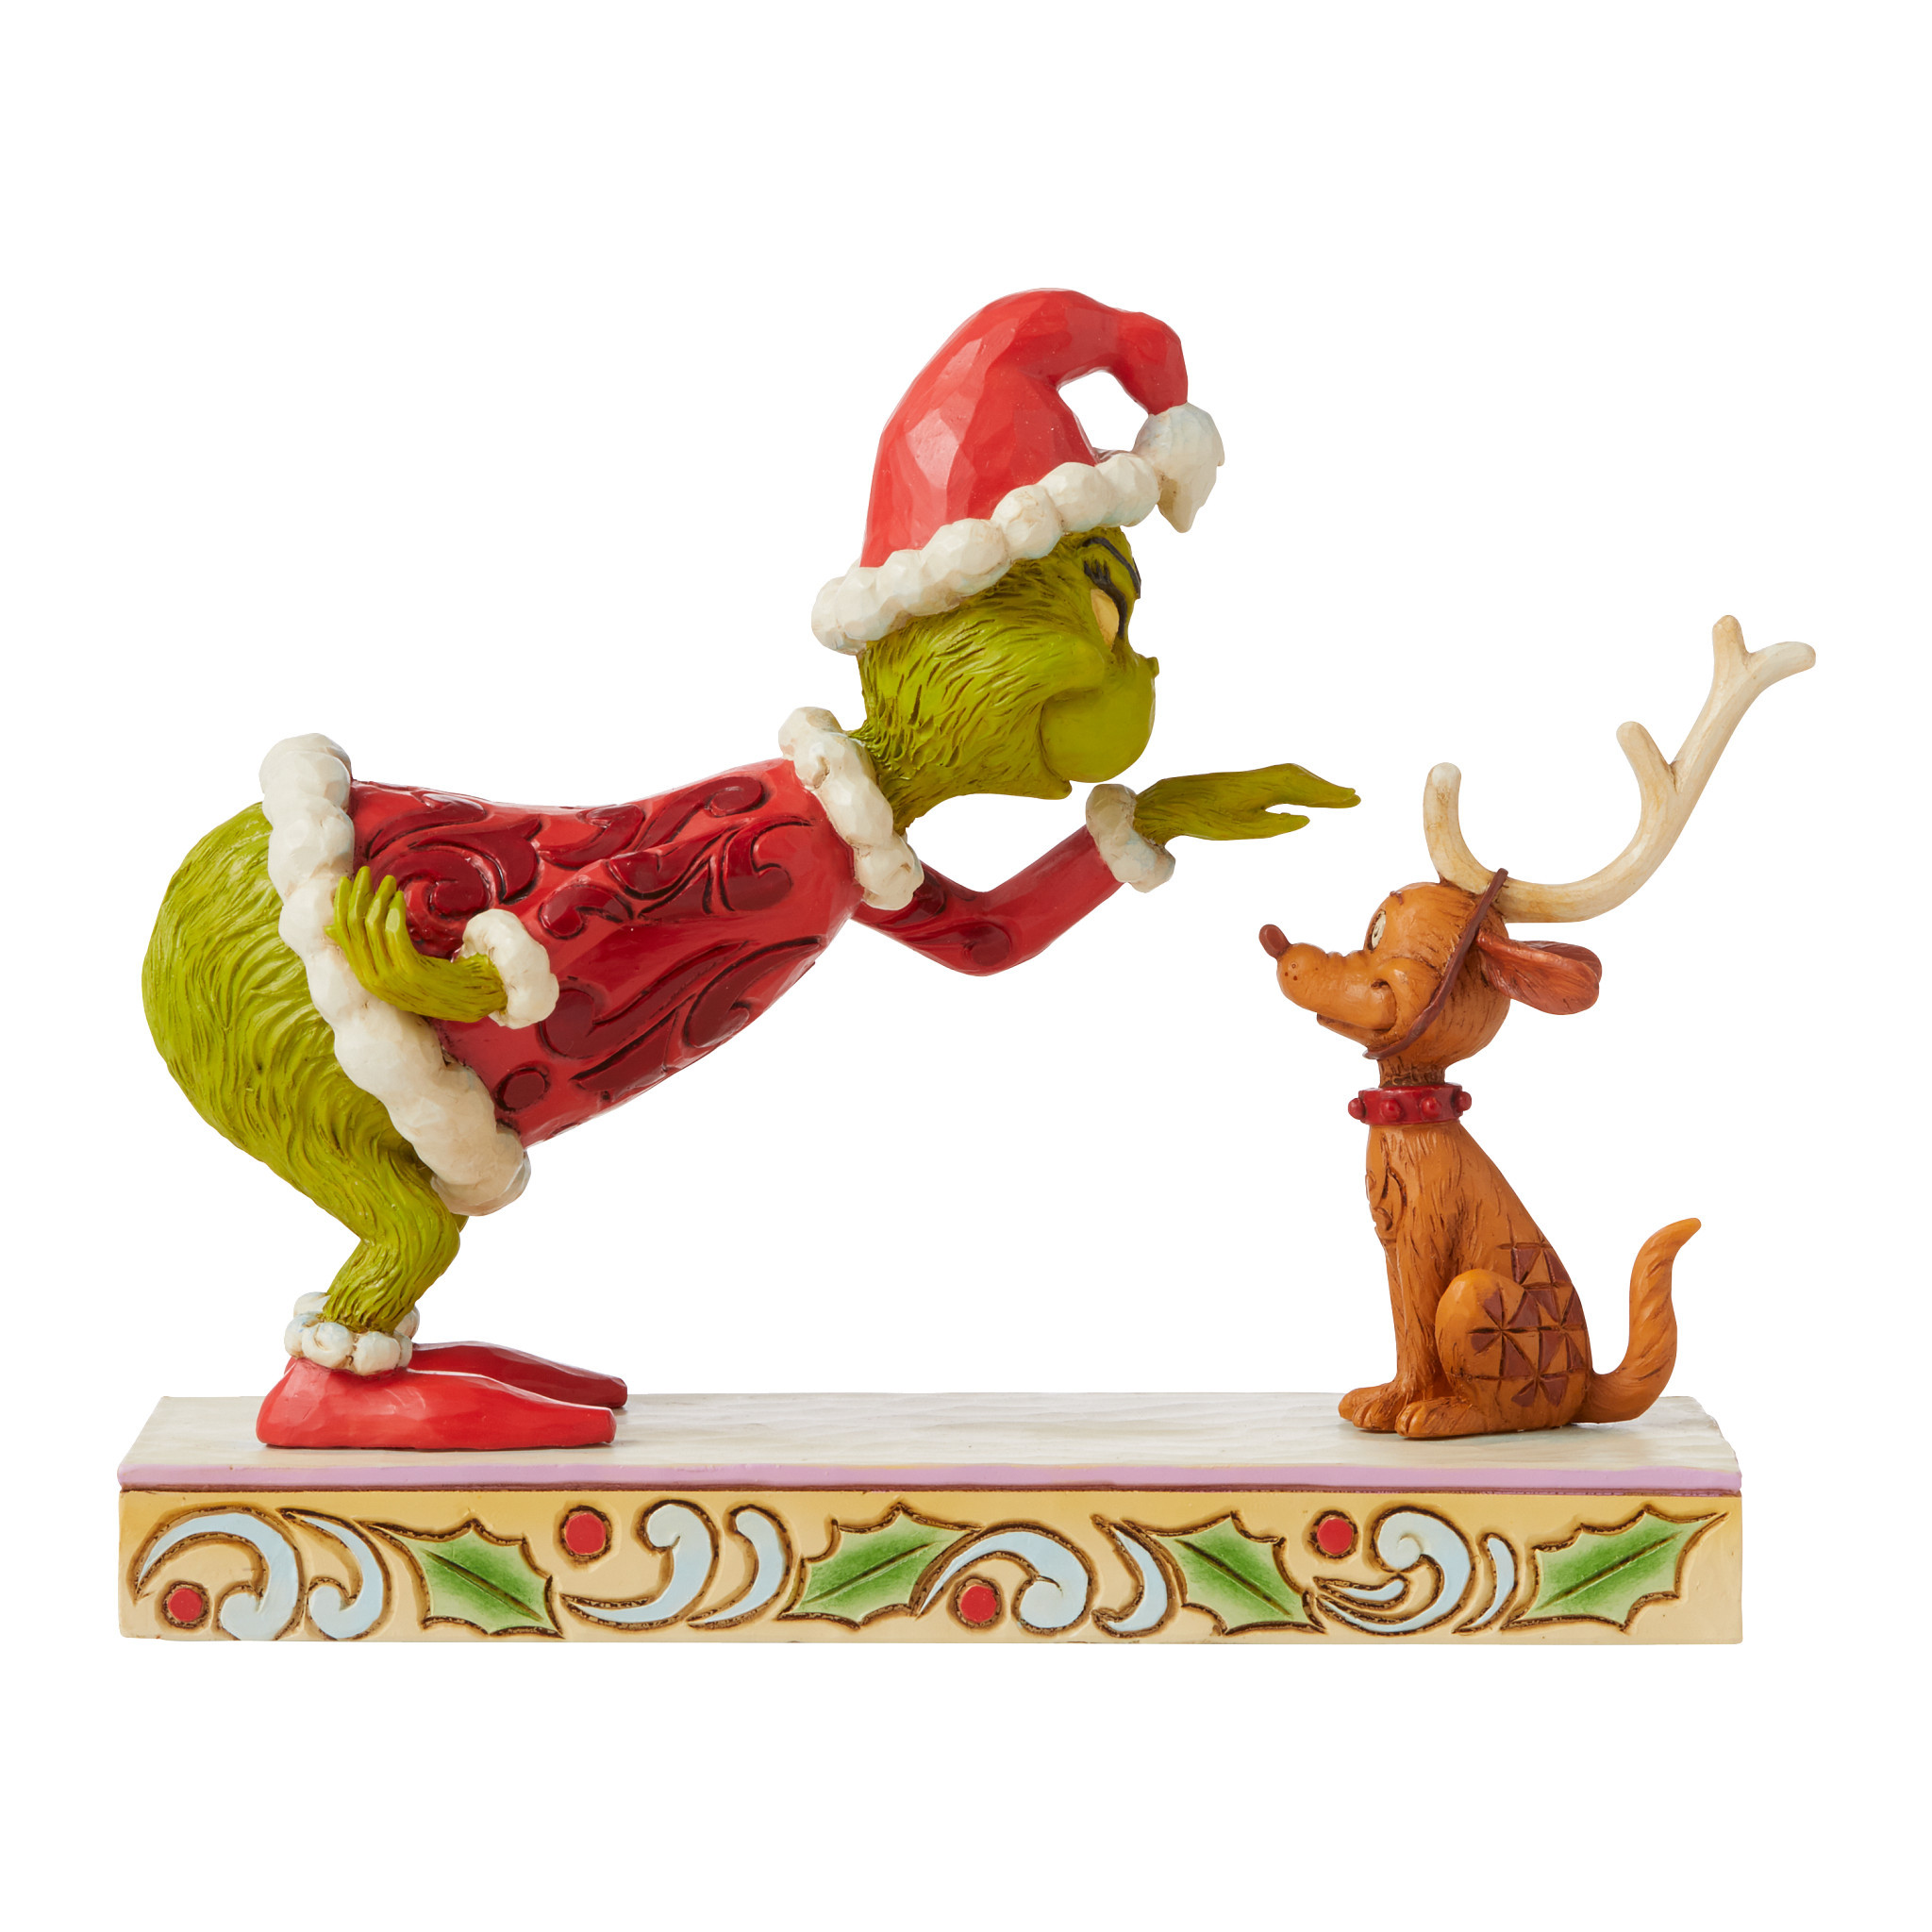 Jim Shore - Figurines 'Grinch Patting Max N' 2021